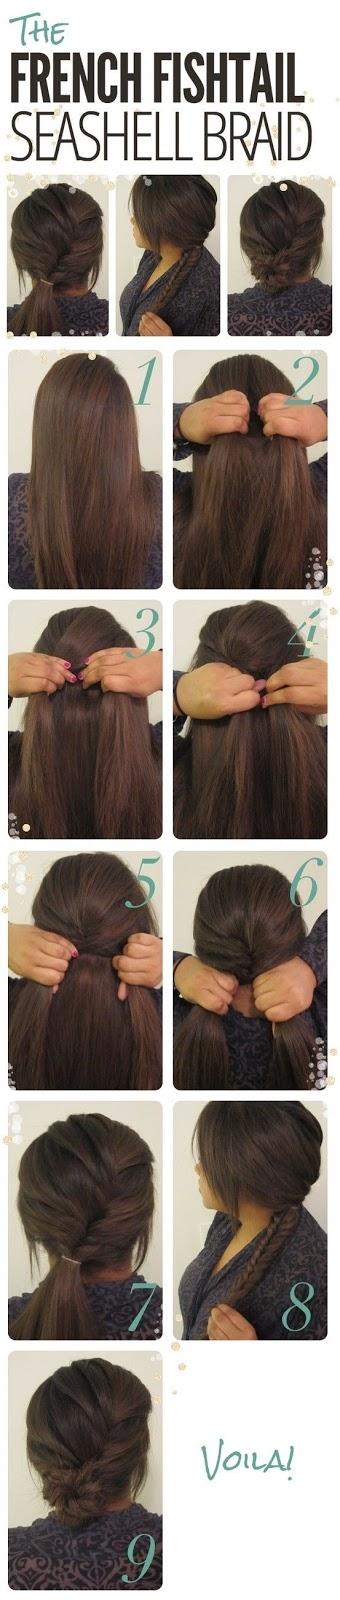 5 braid, pony and bun hairstyles for busy nurses